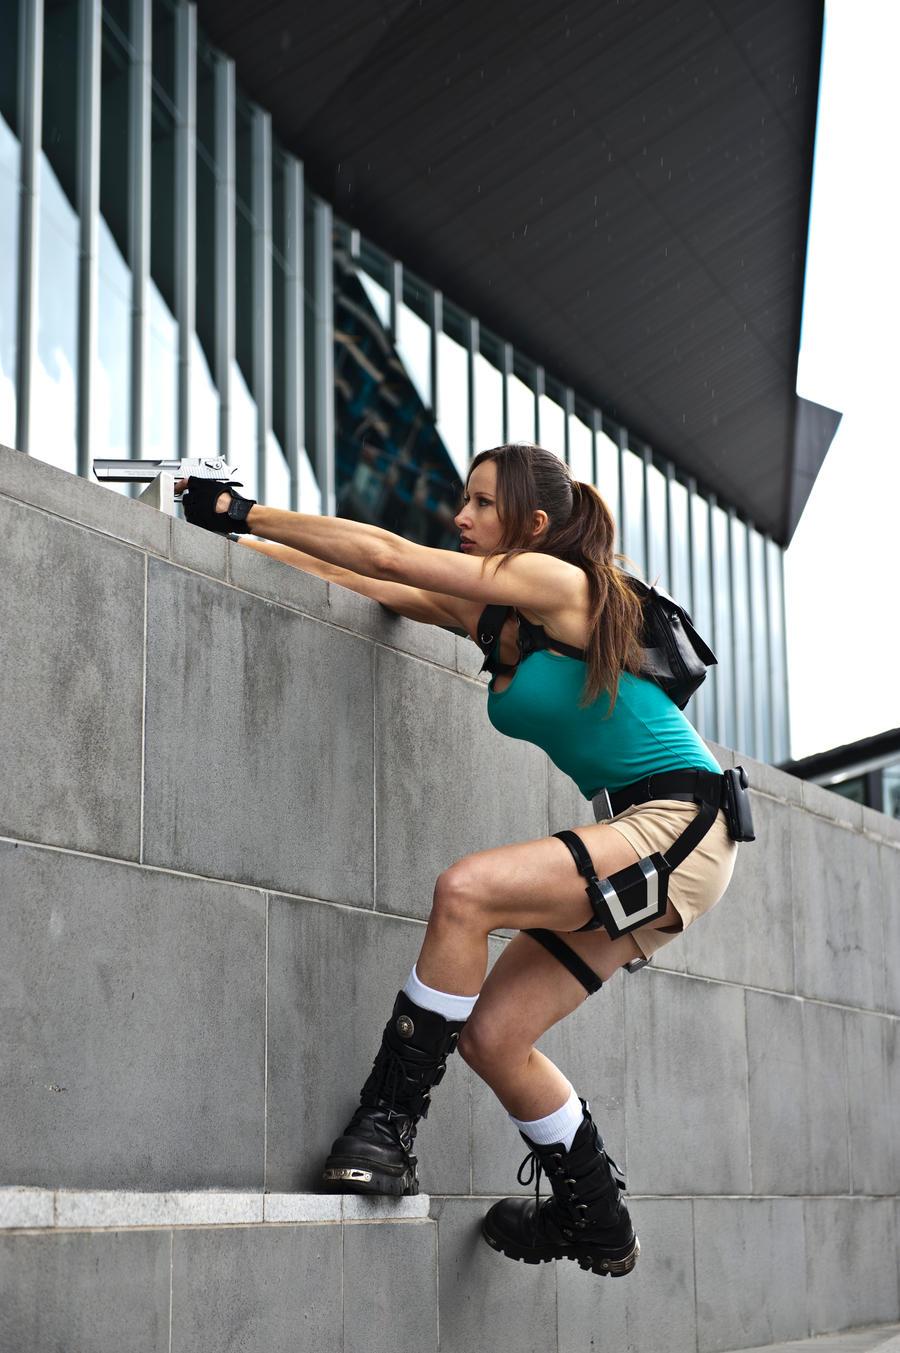 Lara Croft - on the ledge by ShonaAdventures